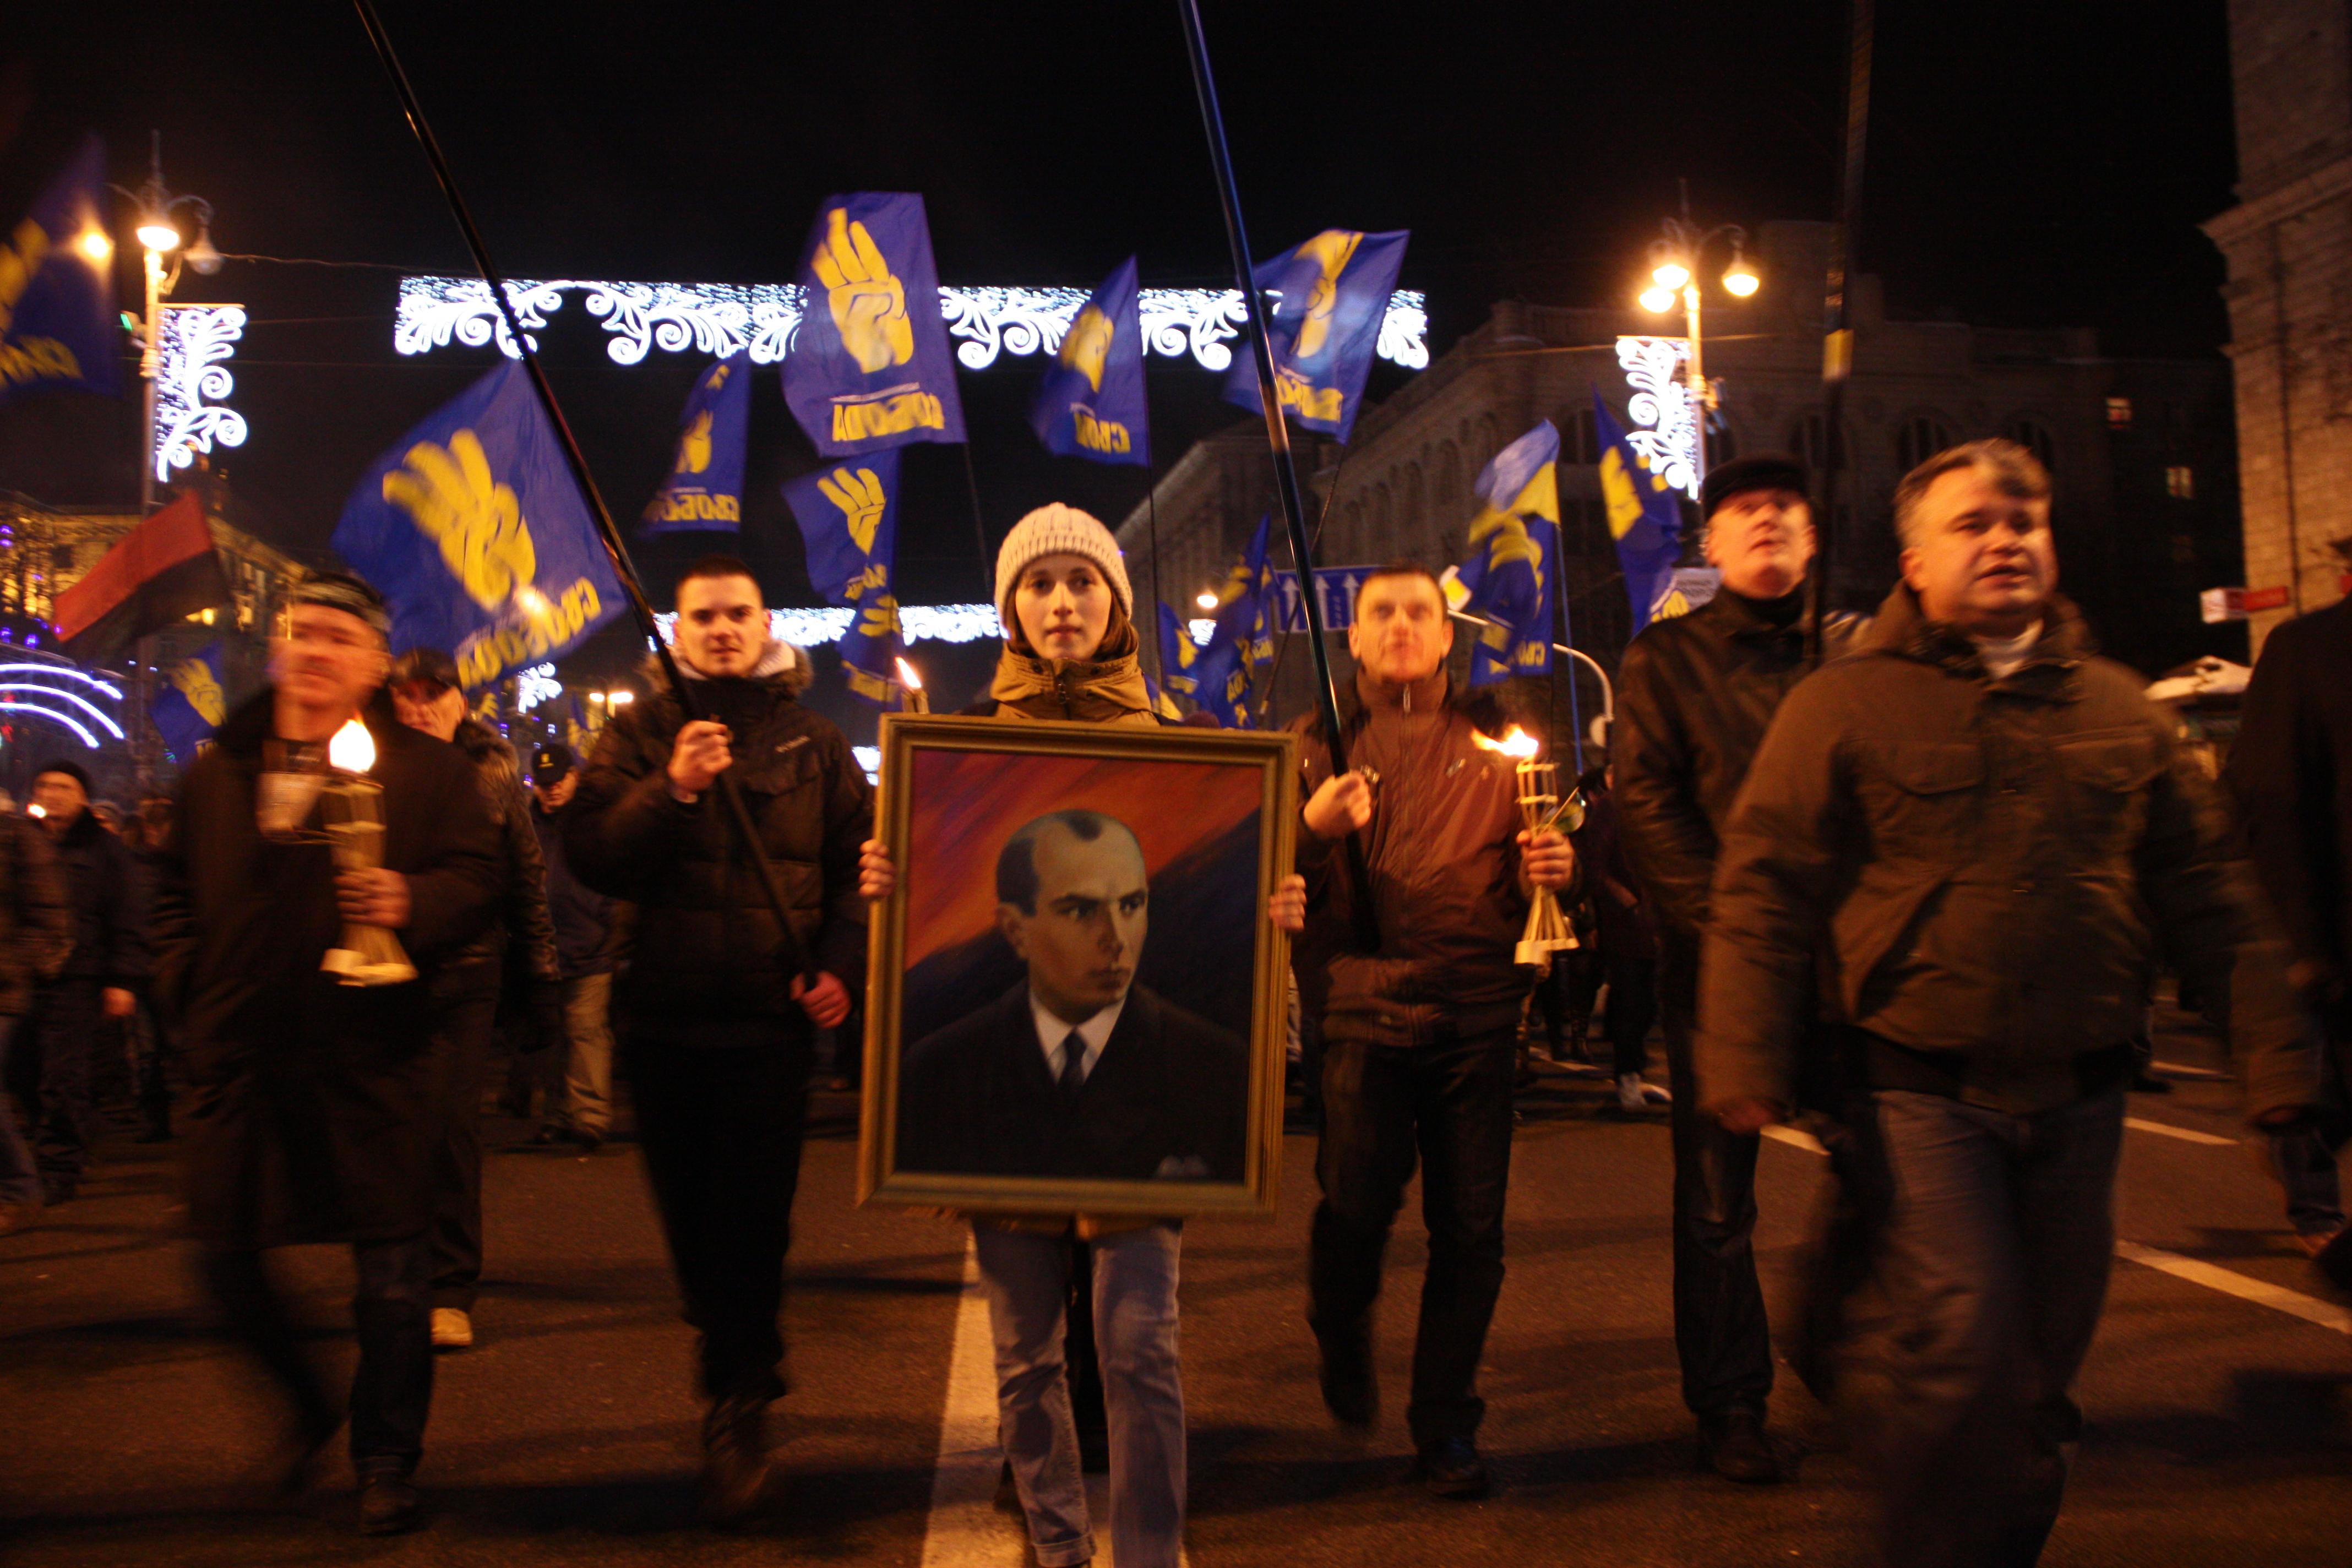 Civil War Looms in Ukraine? Regime Calls for Military Mobilization, IMF Austerity Measures